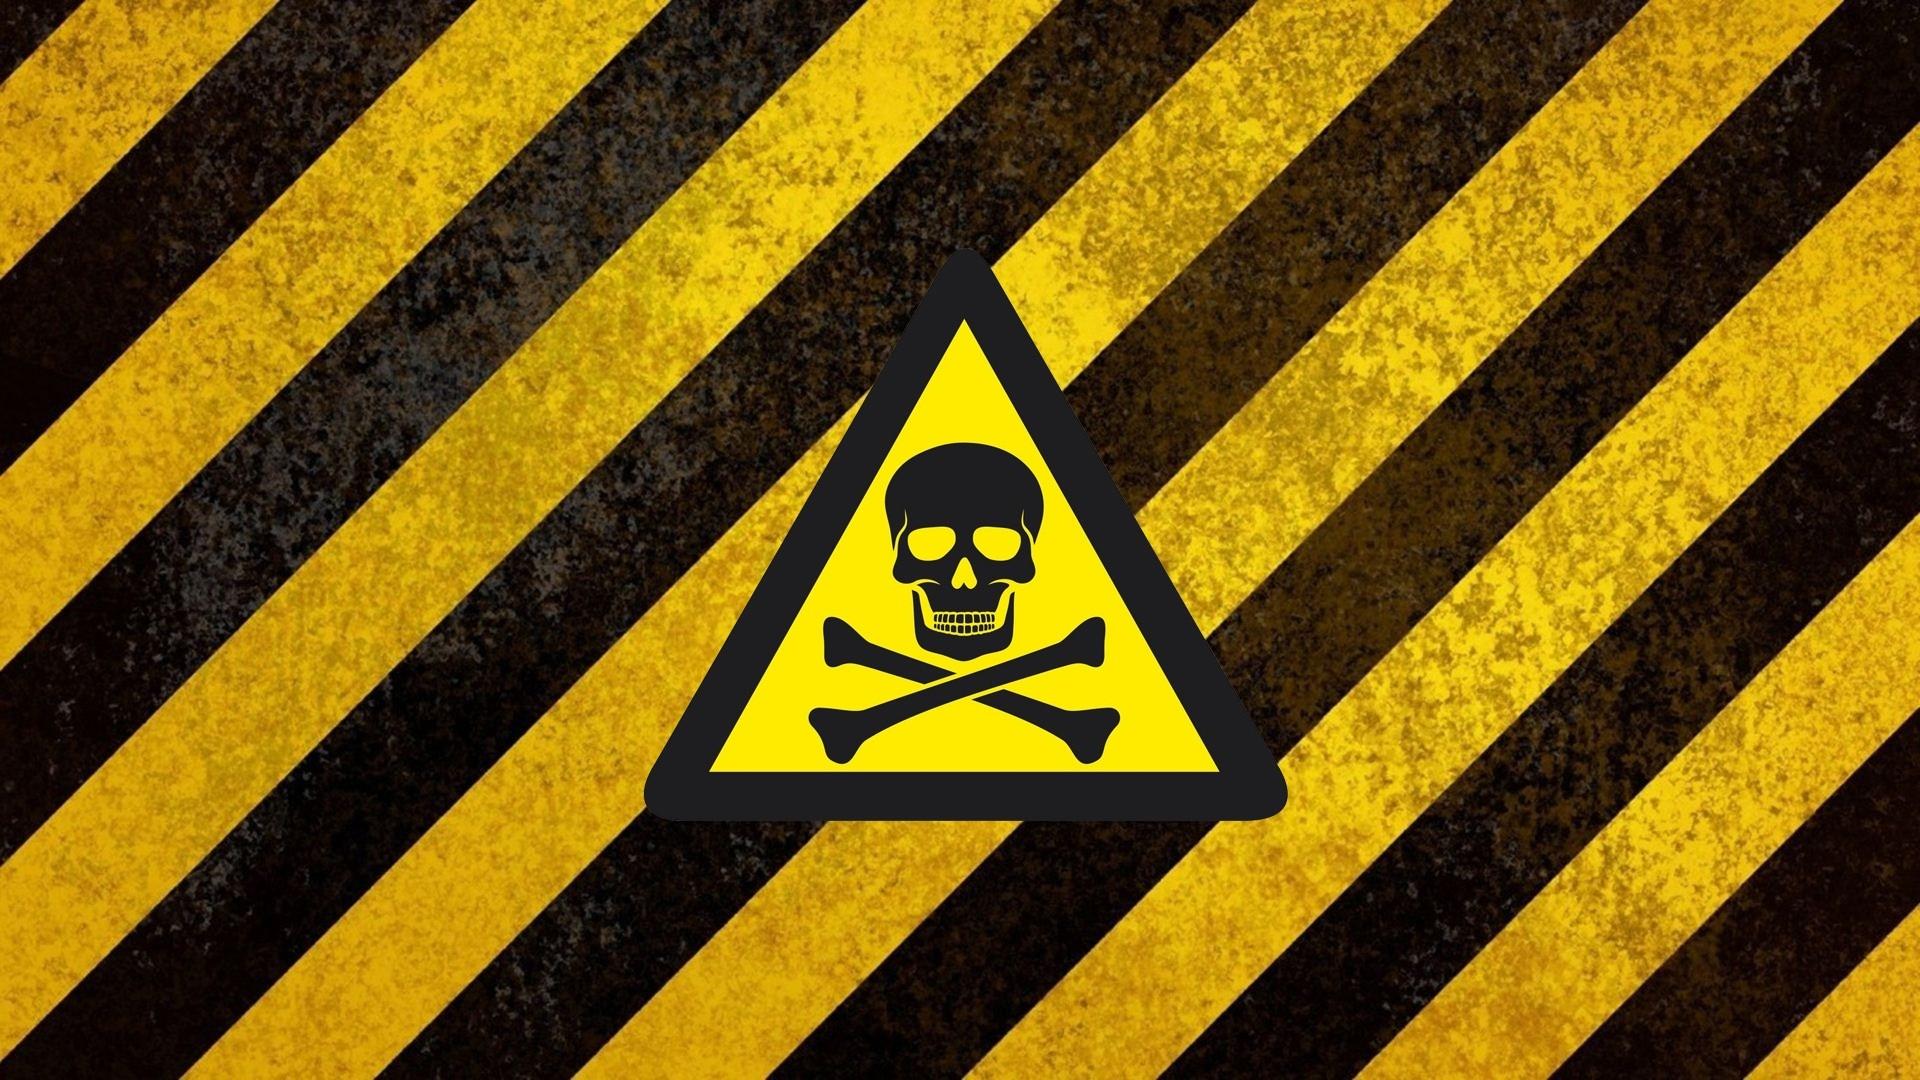 Danger Download Free Wallpaper Image Search